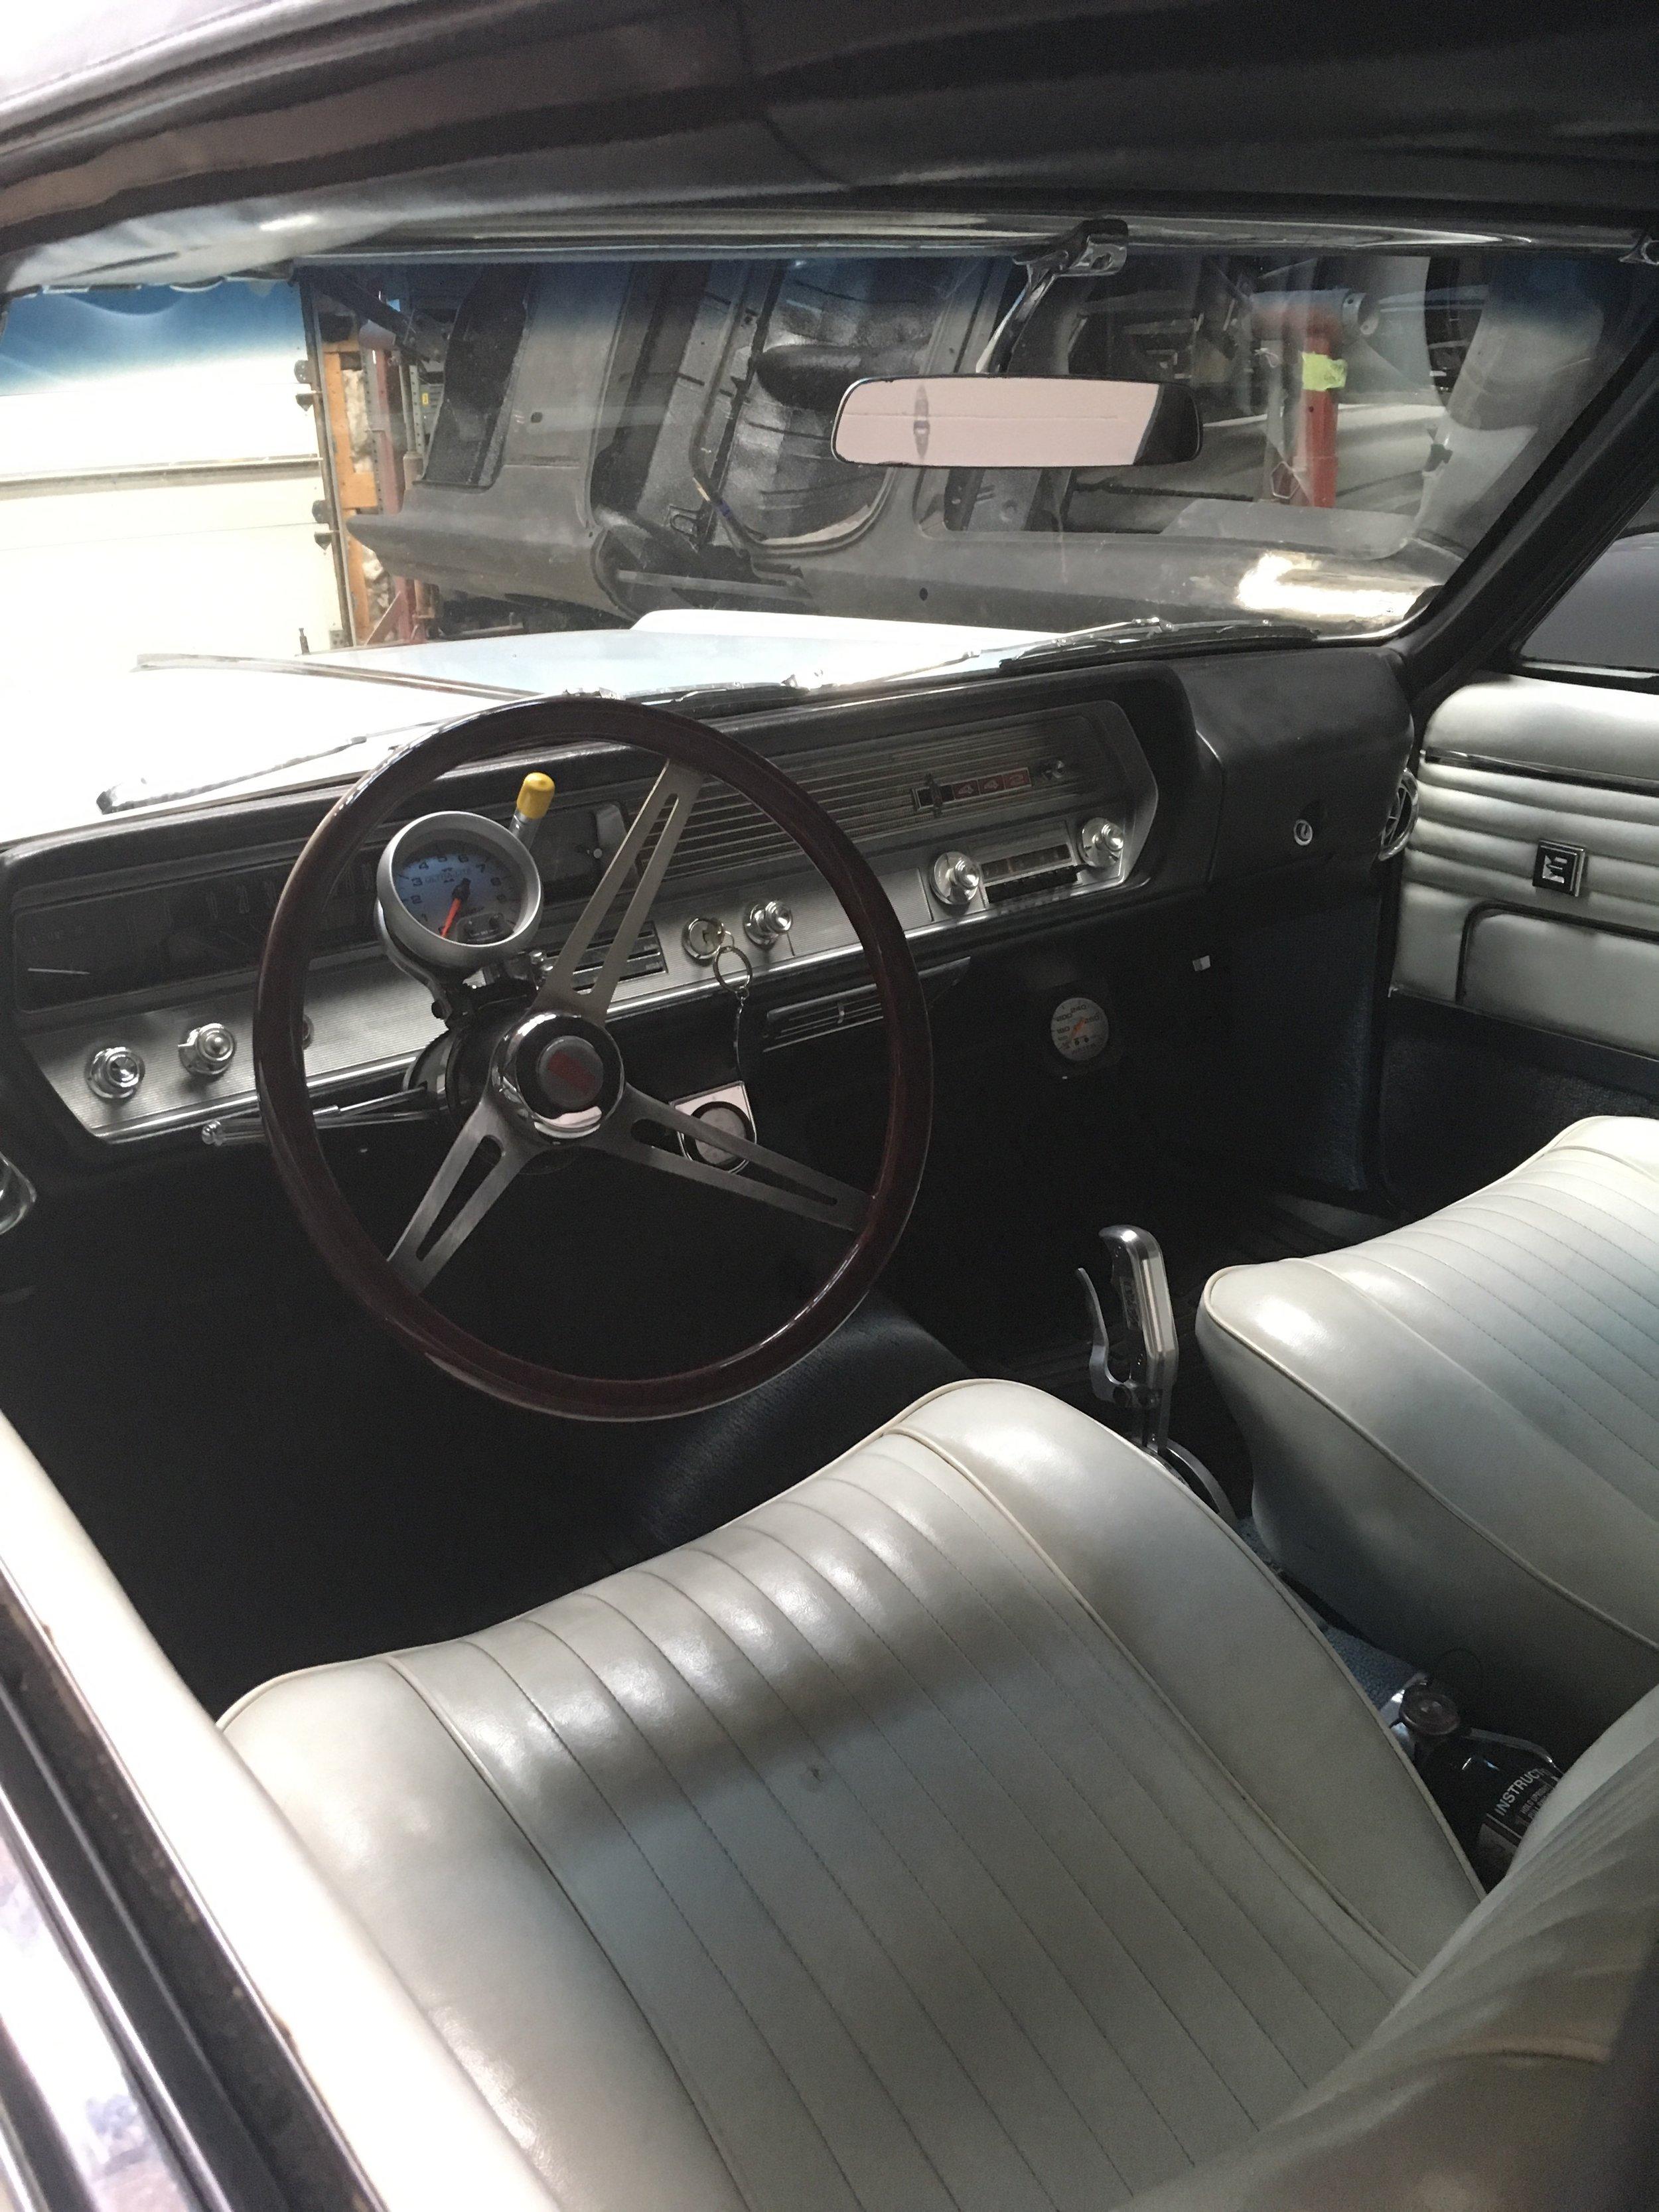 1965-442-minnesota-muscle-car-restoration-interior-hot-rod-factory.jpg